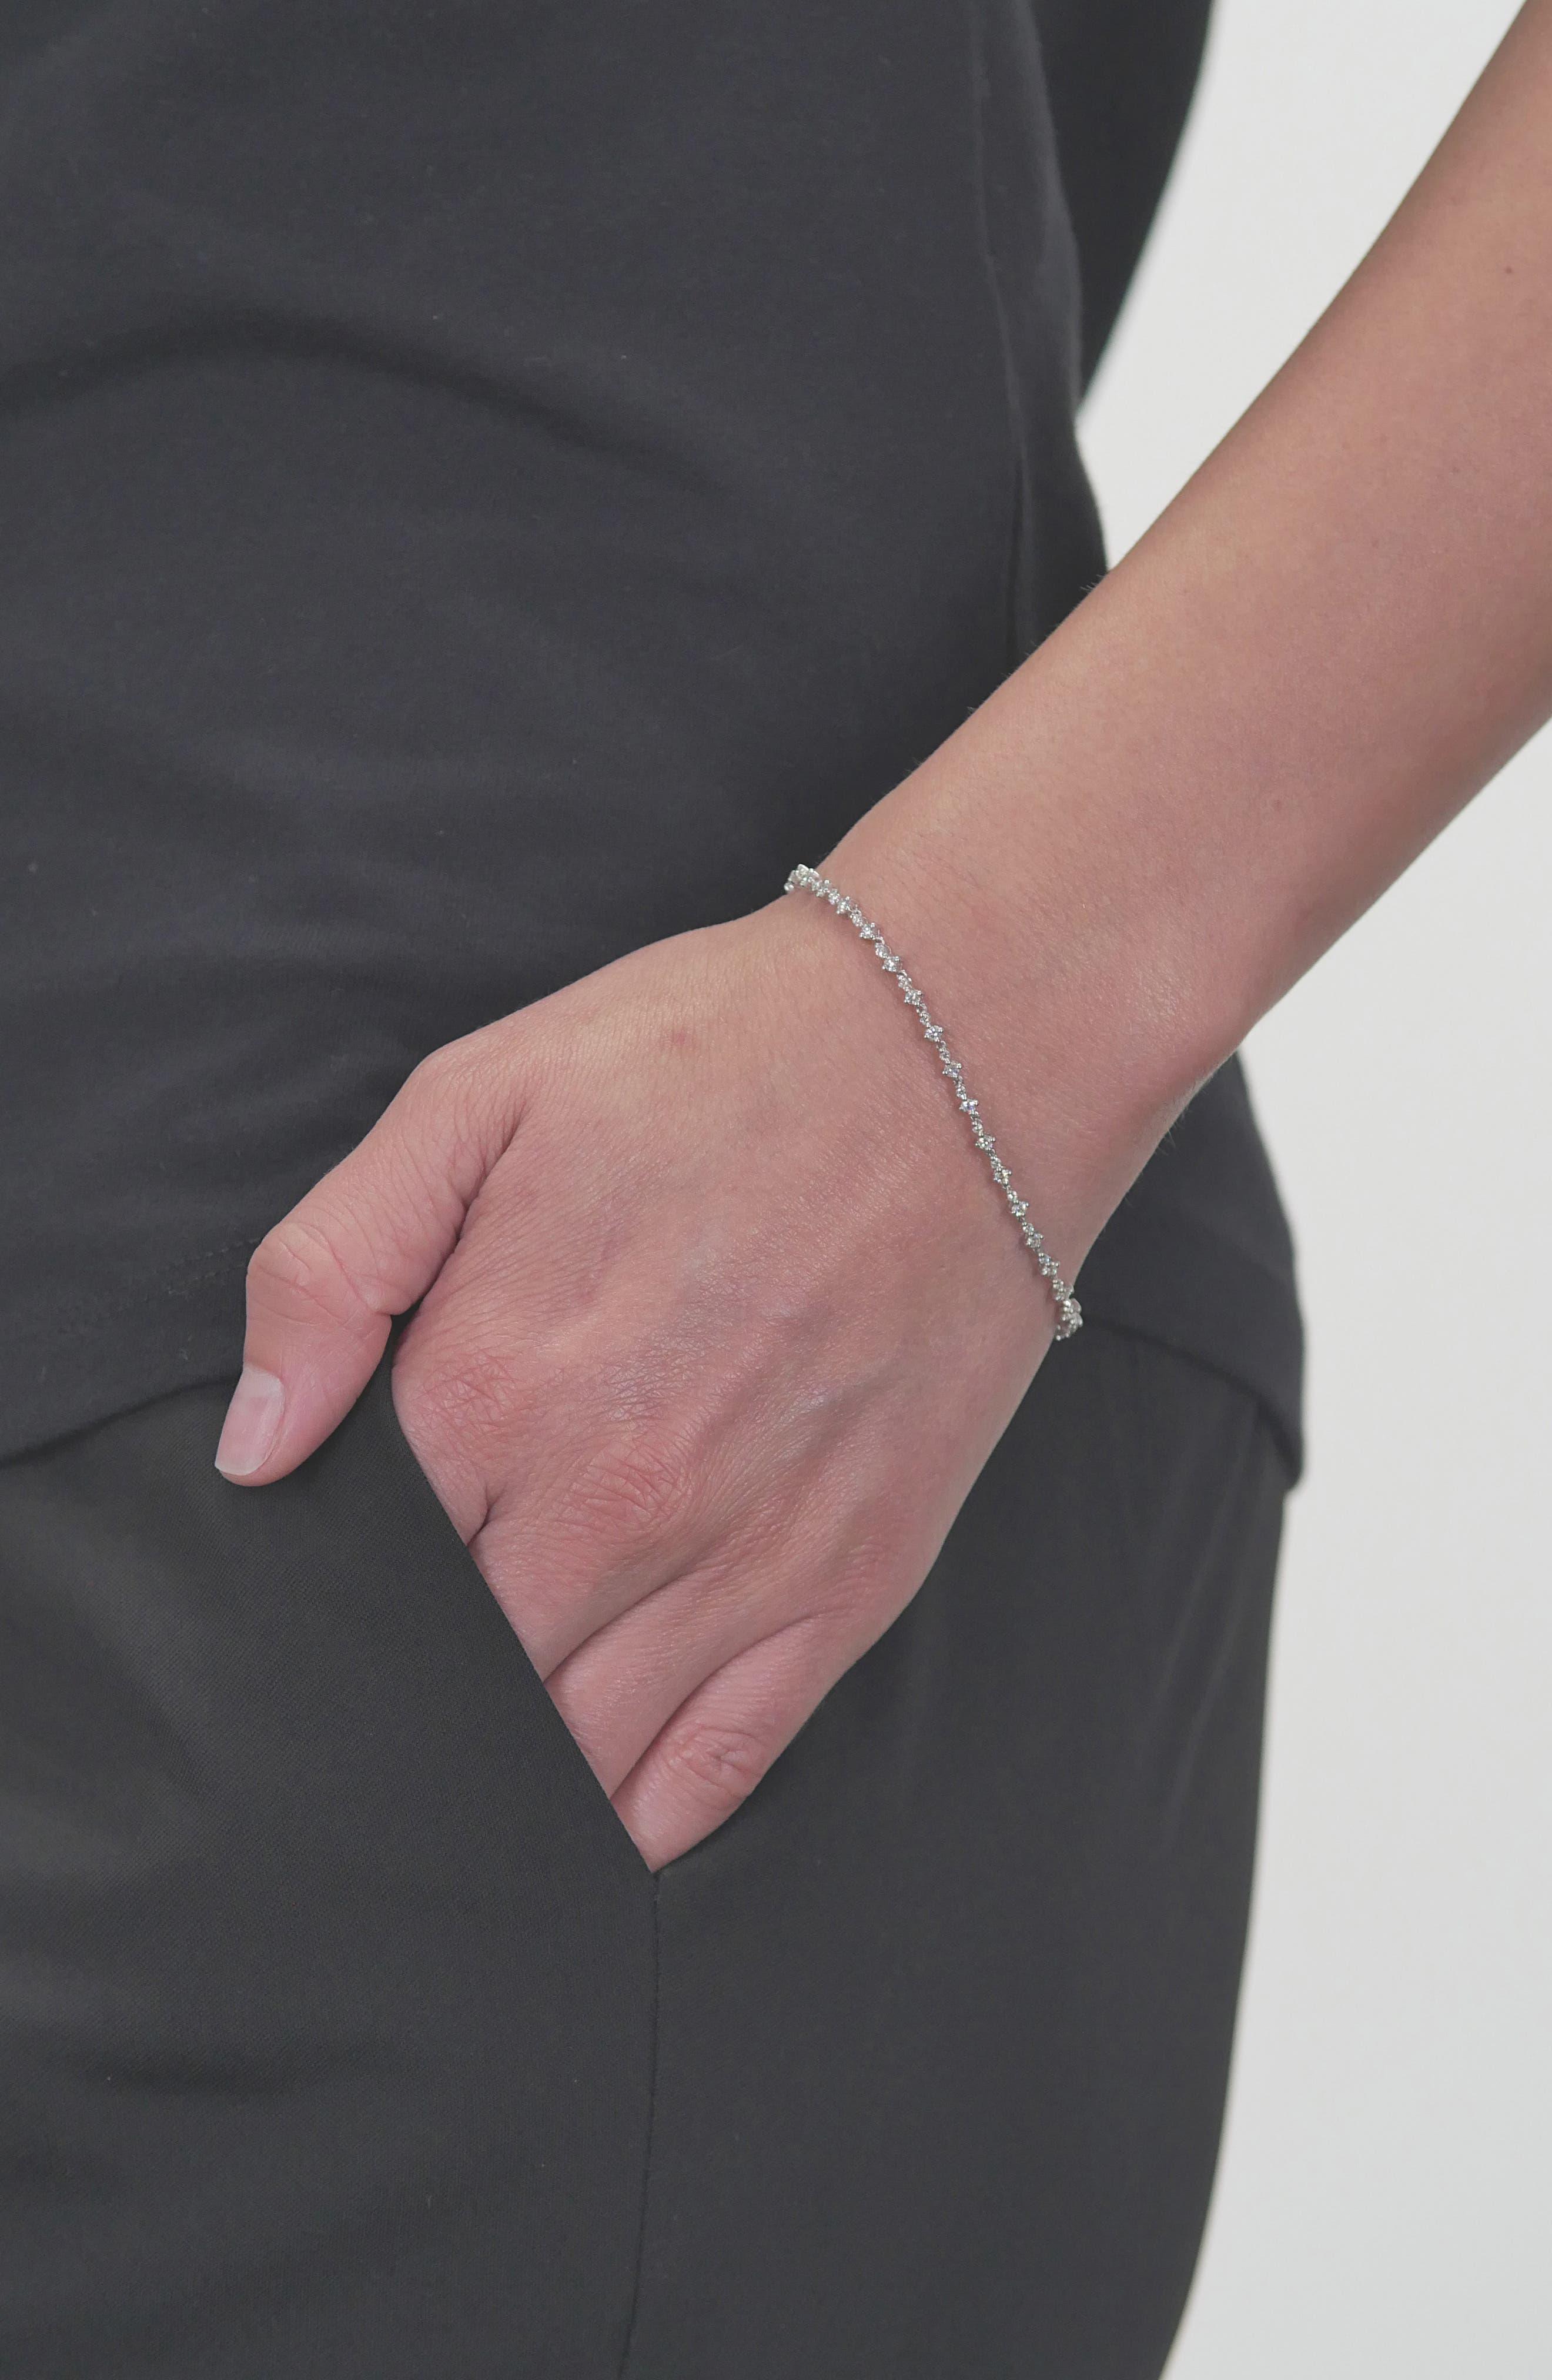 Botanical Diamond Tennis Bracelet,                             Alternate thumbnail 2, color,                             WHITE GOLD